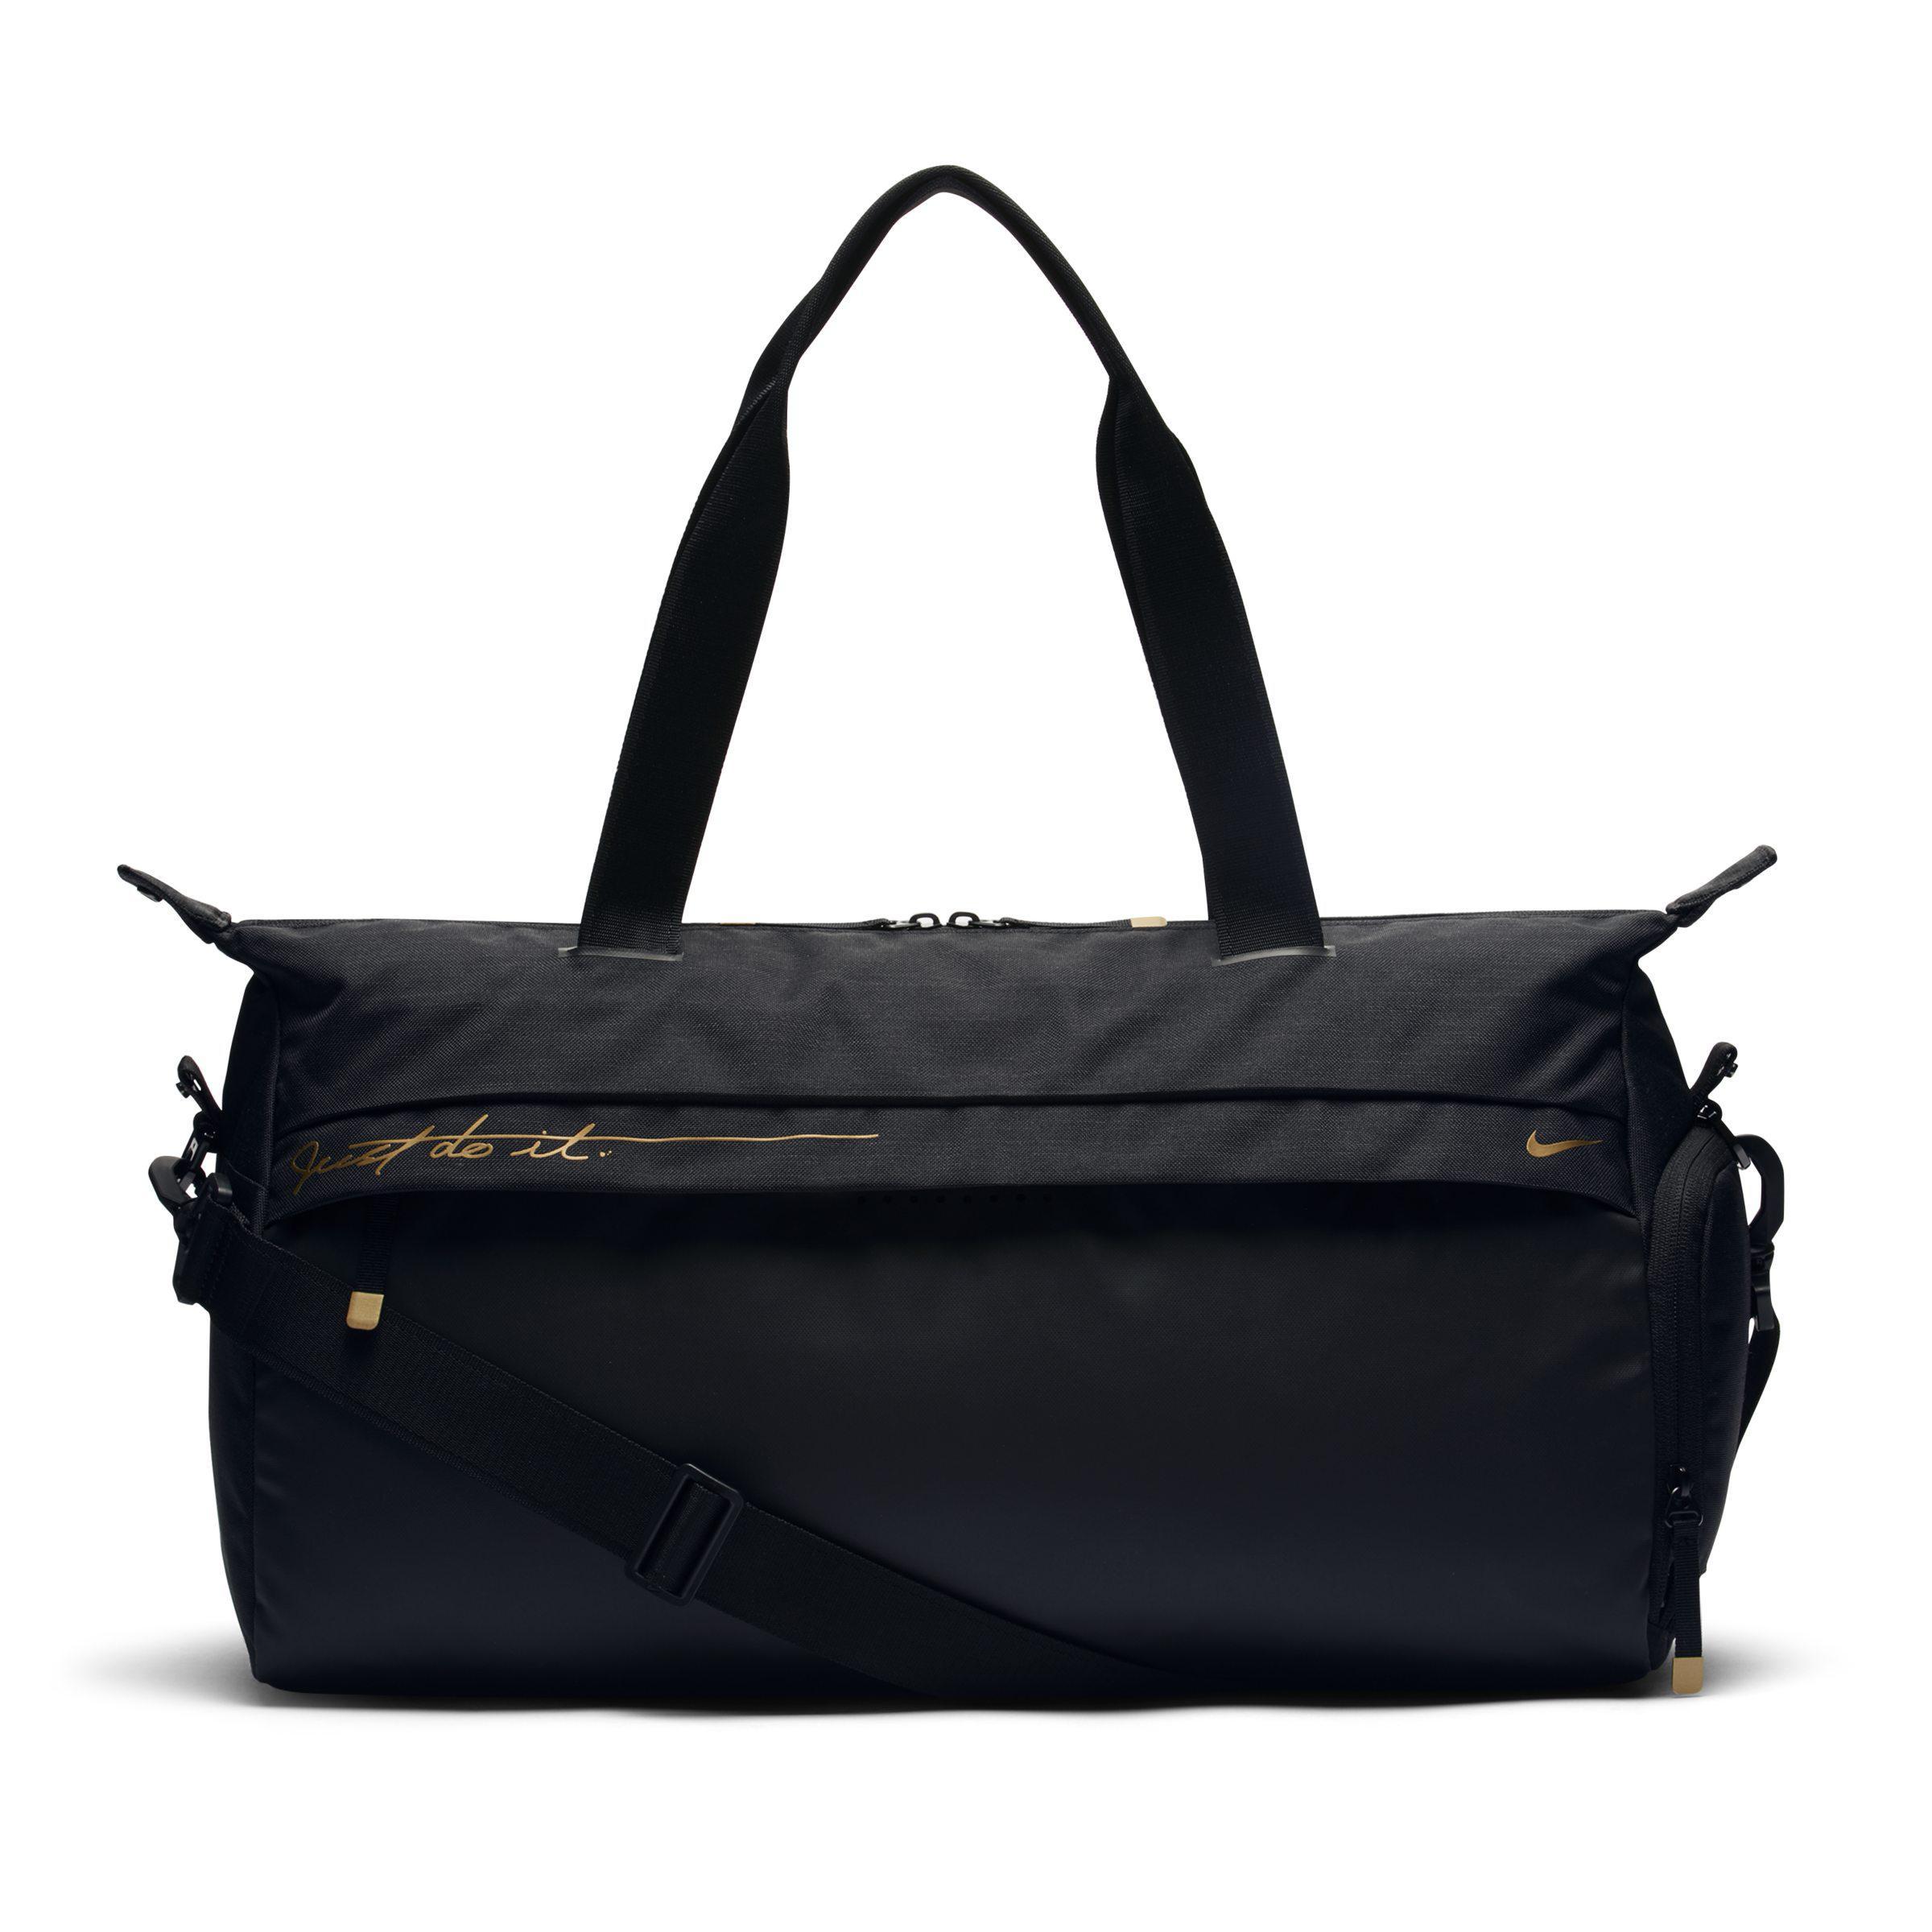 9fec191b4e Nike Radiate Graphic Training Club Bag in Black - Lyst